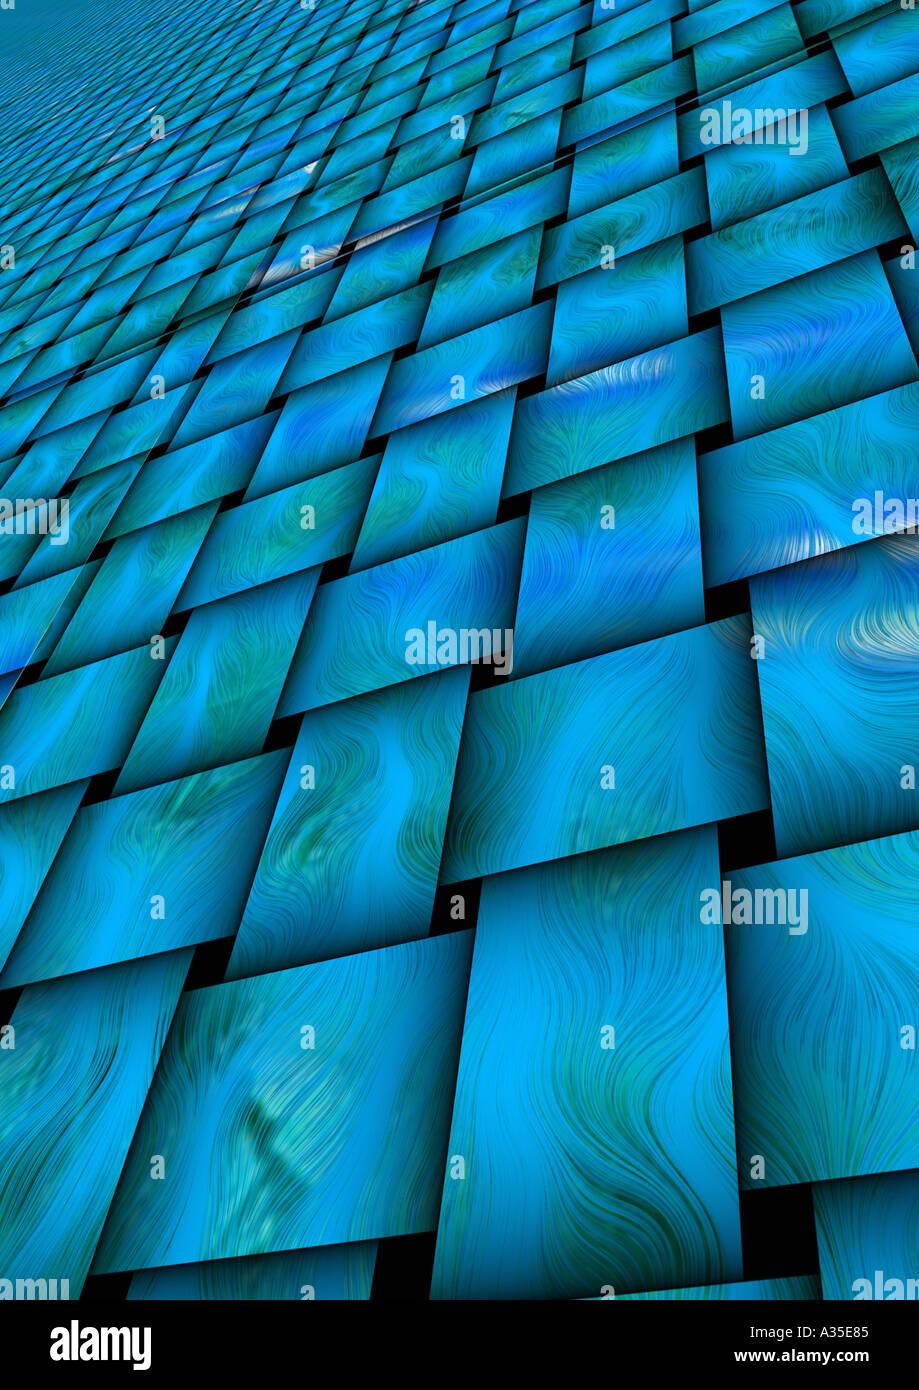 Cosmic braid - Stock Image